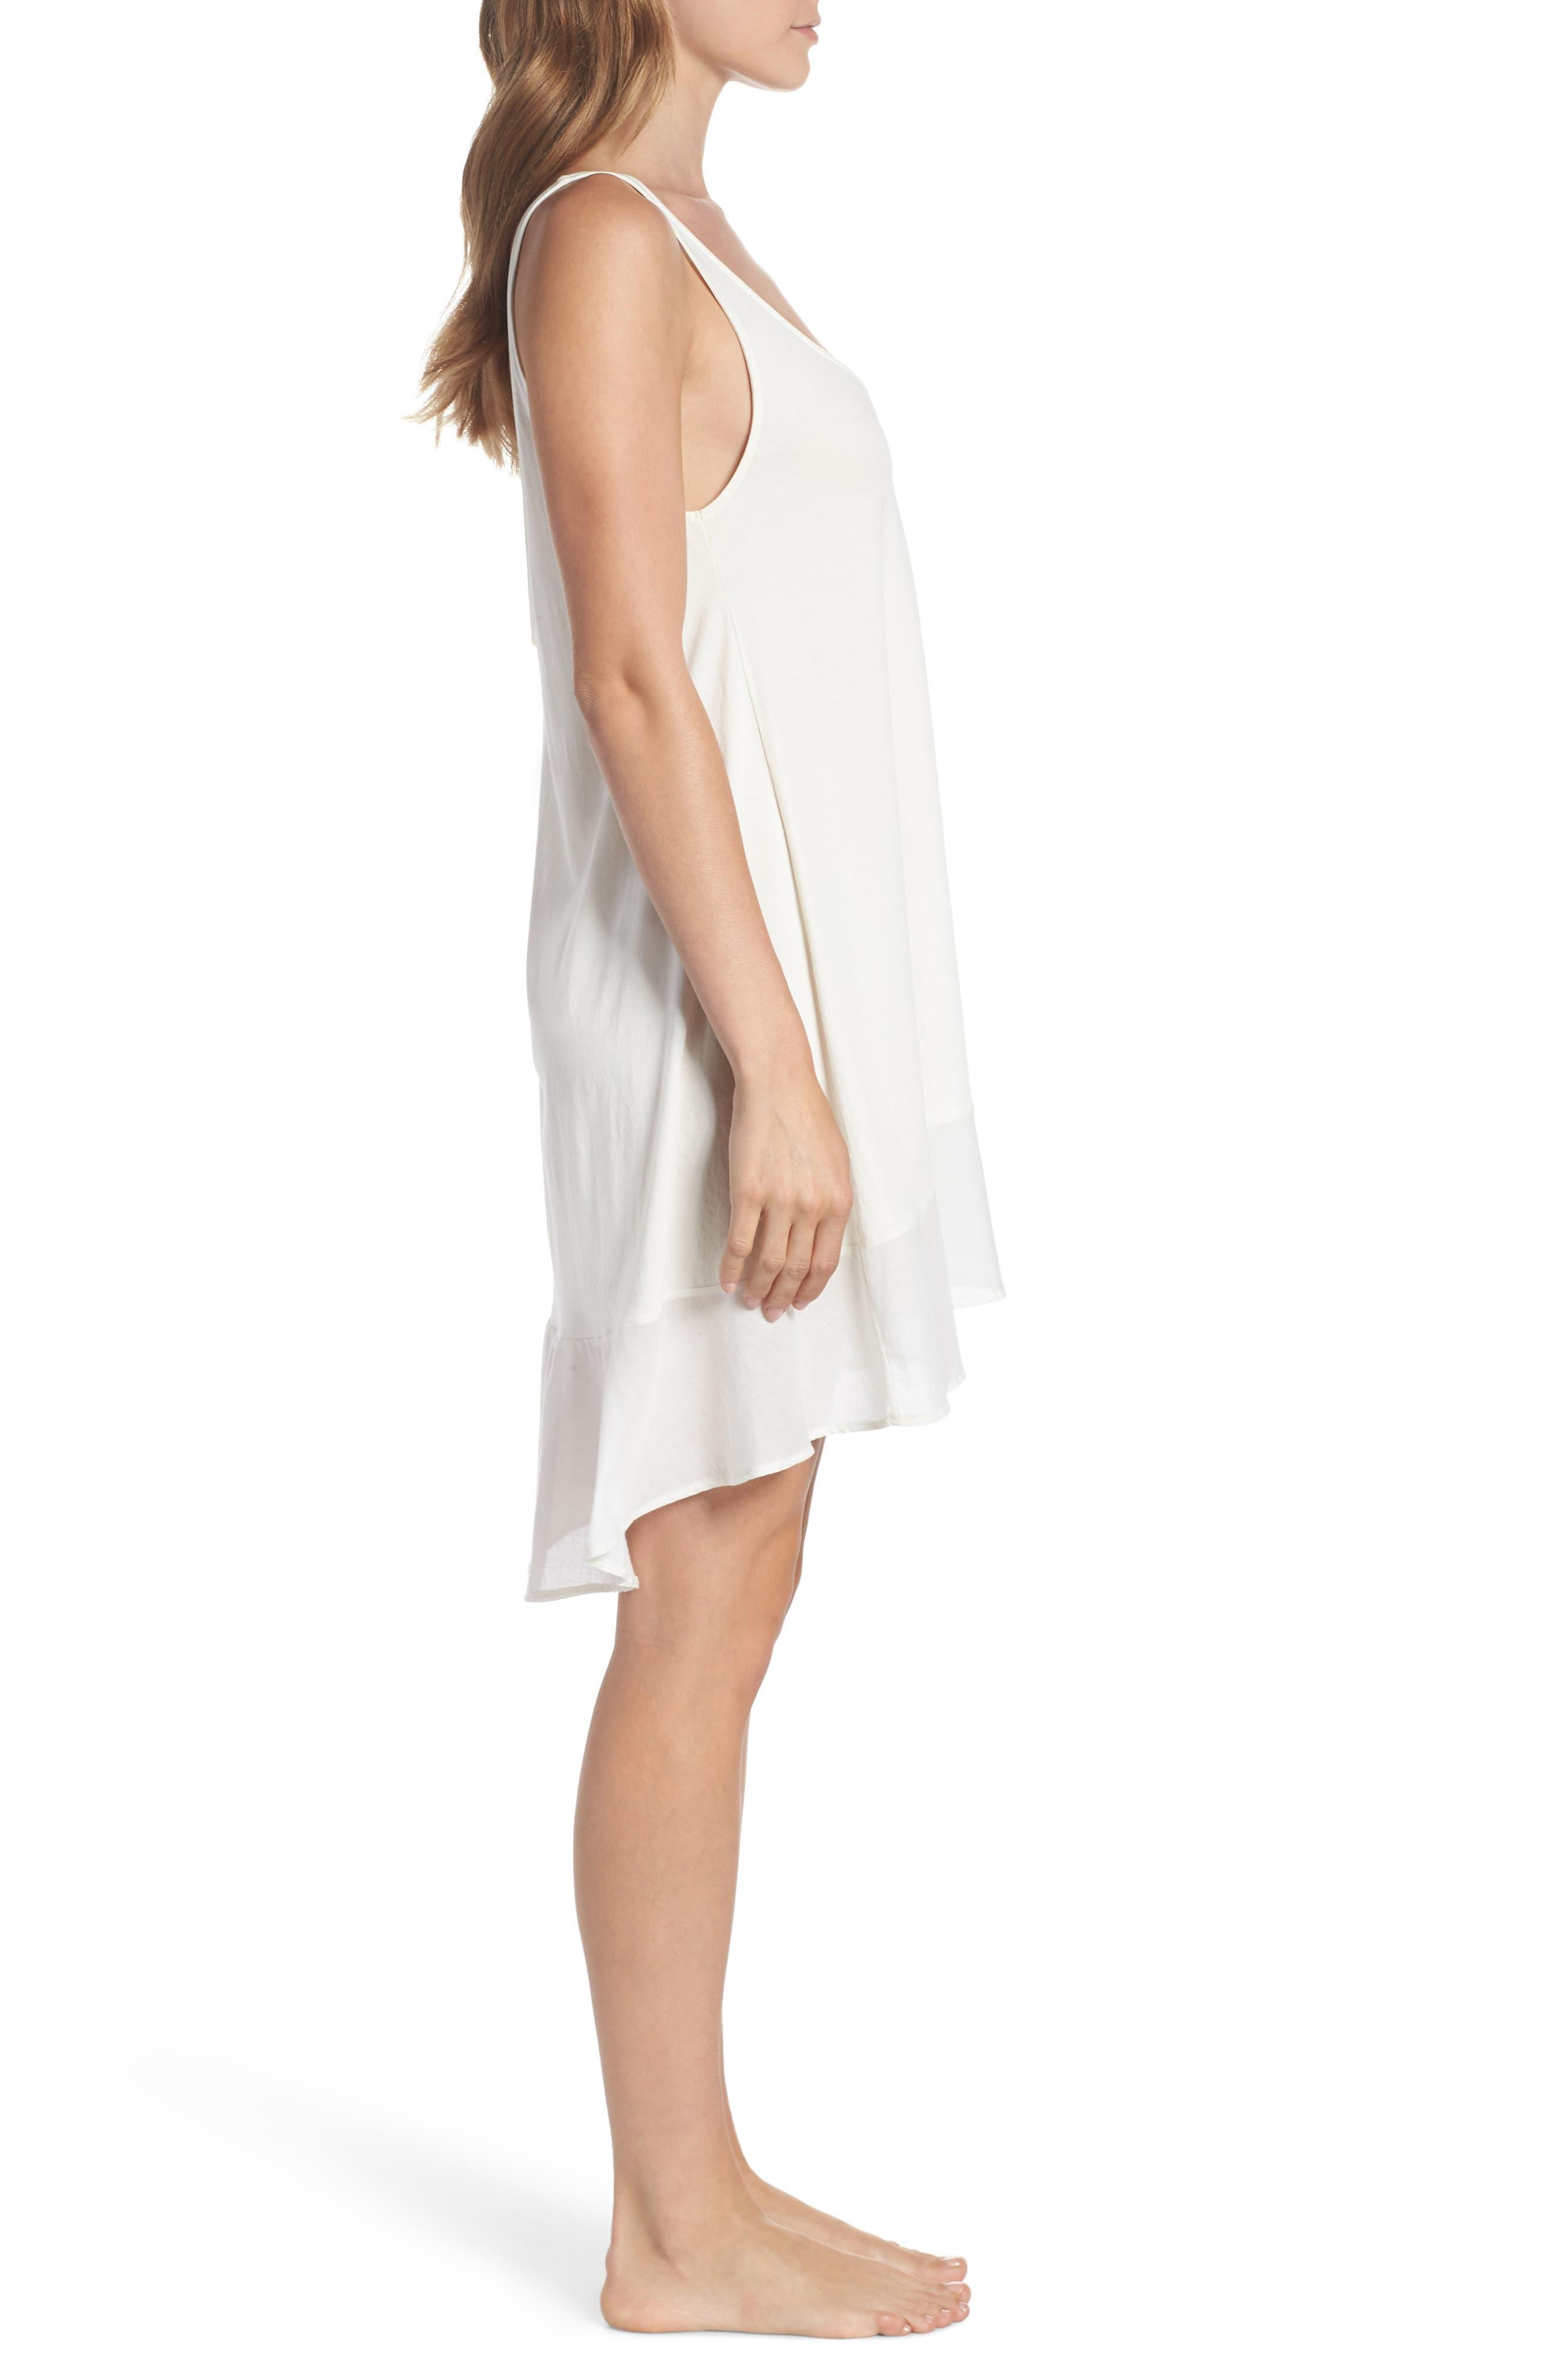 Bettina Pima Cotton Voile Nightgown,                             Alternate thumbnail 3, color,                             900